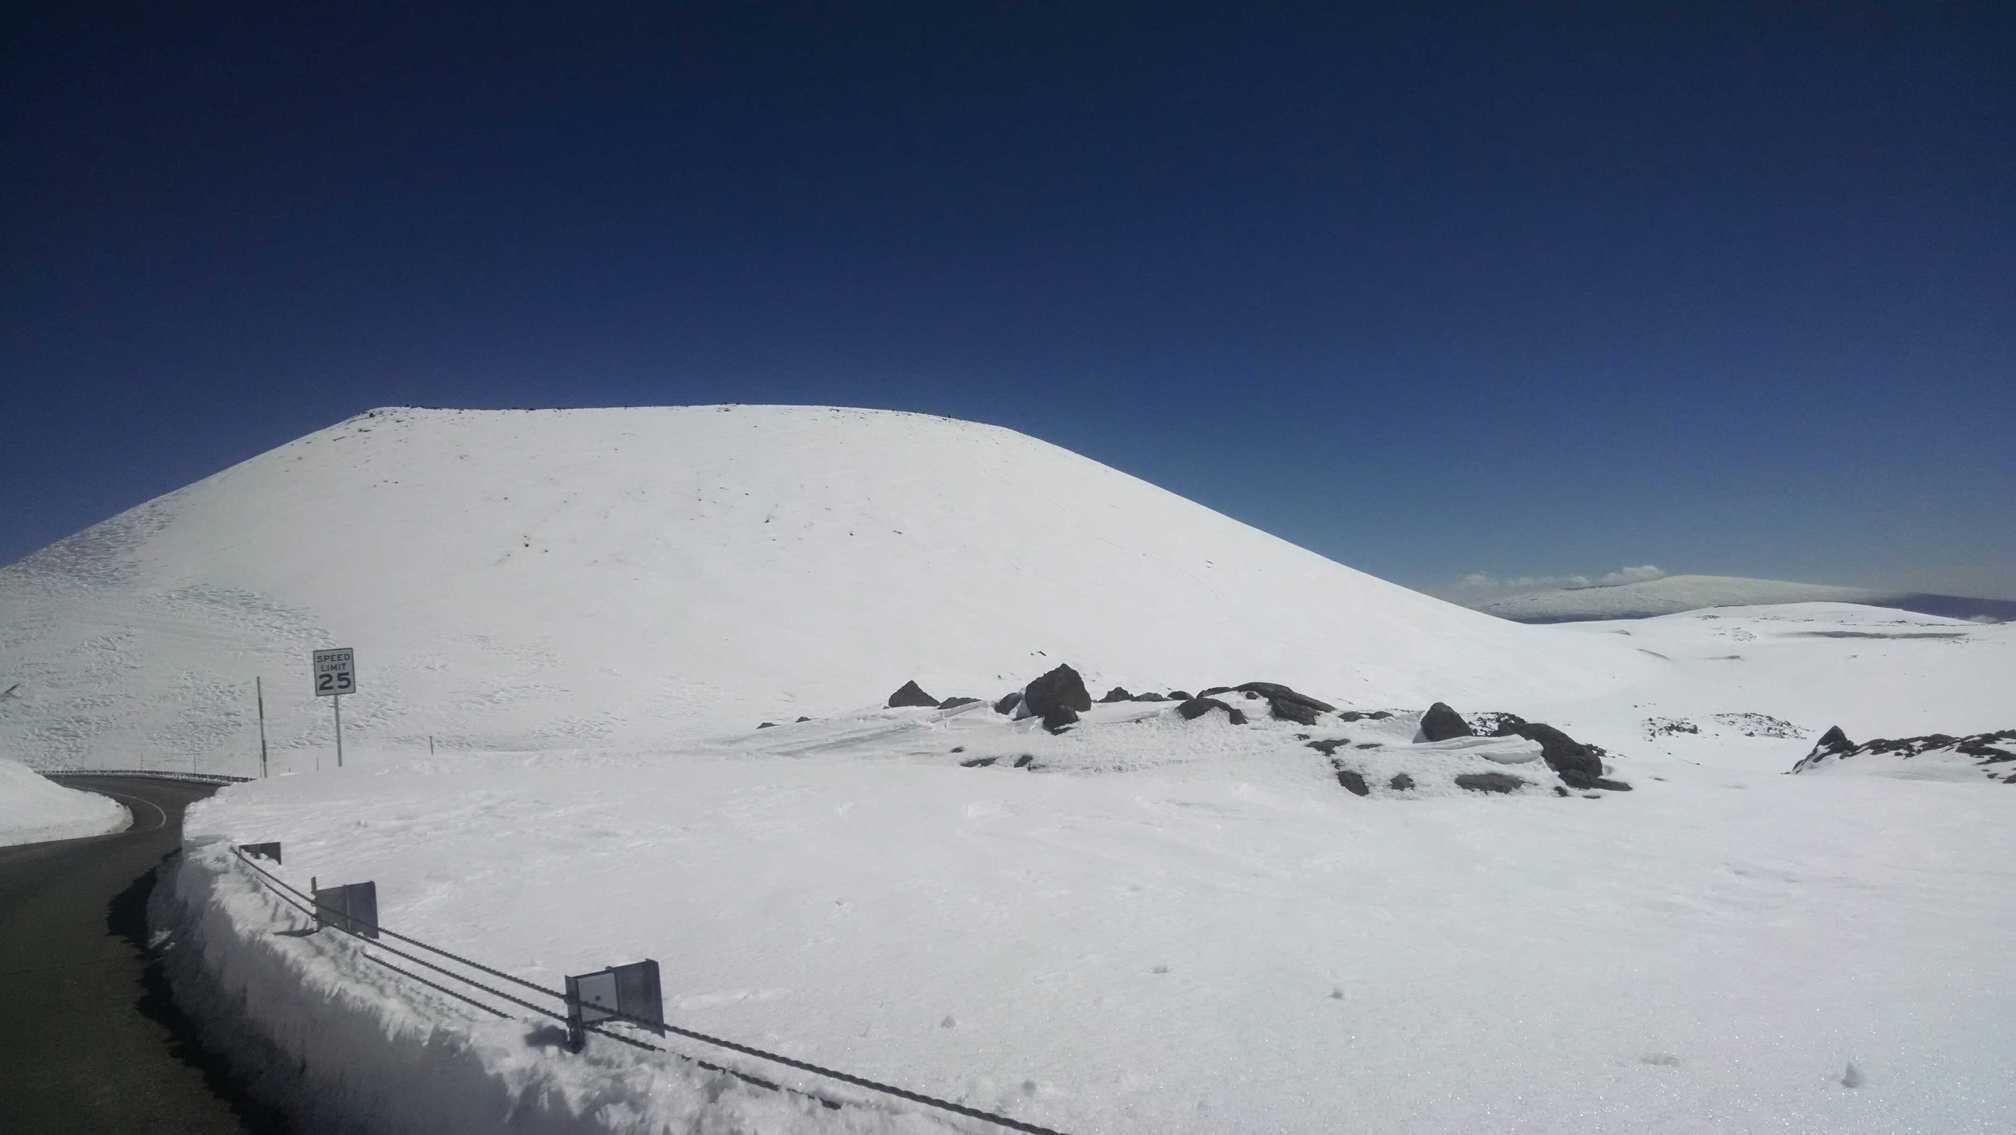 Mauna Kea snow 3.15.15 / Image: Chelsea Demello